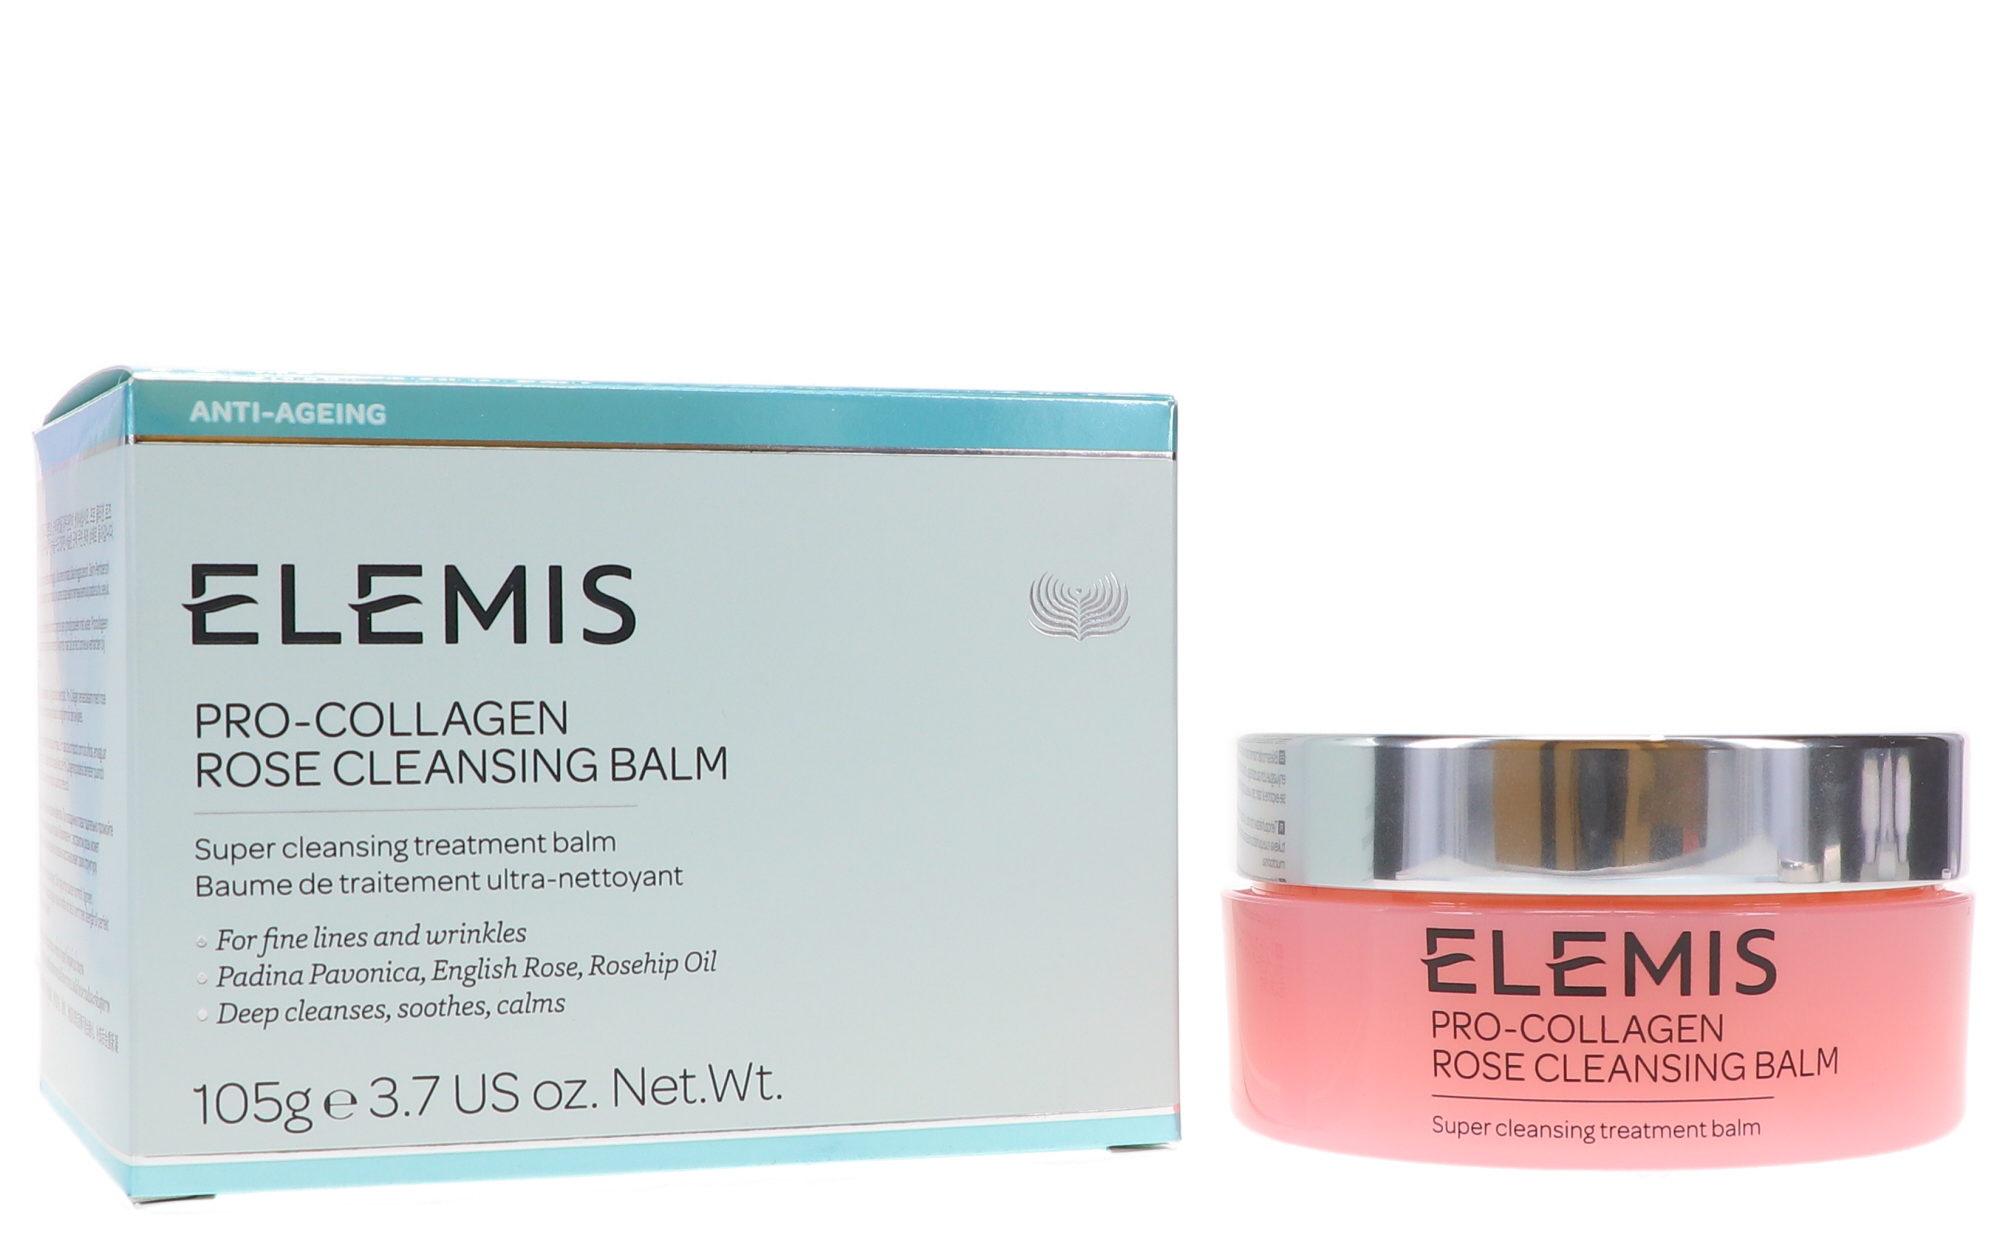 ELEMIS Pro-Collagen Rose Cleansing Balm, 3.7 oz.